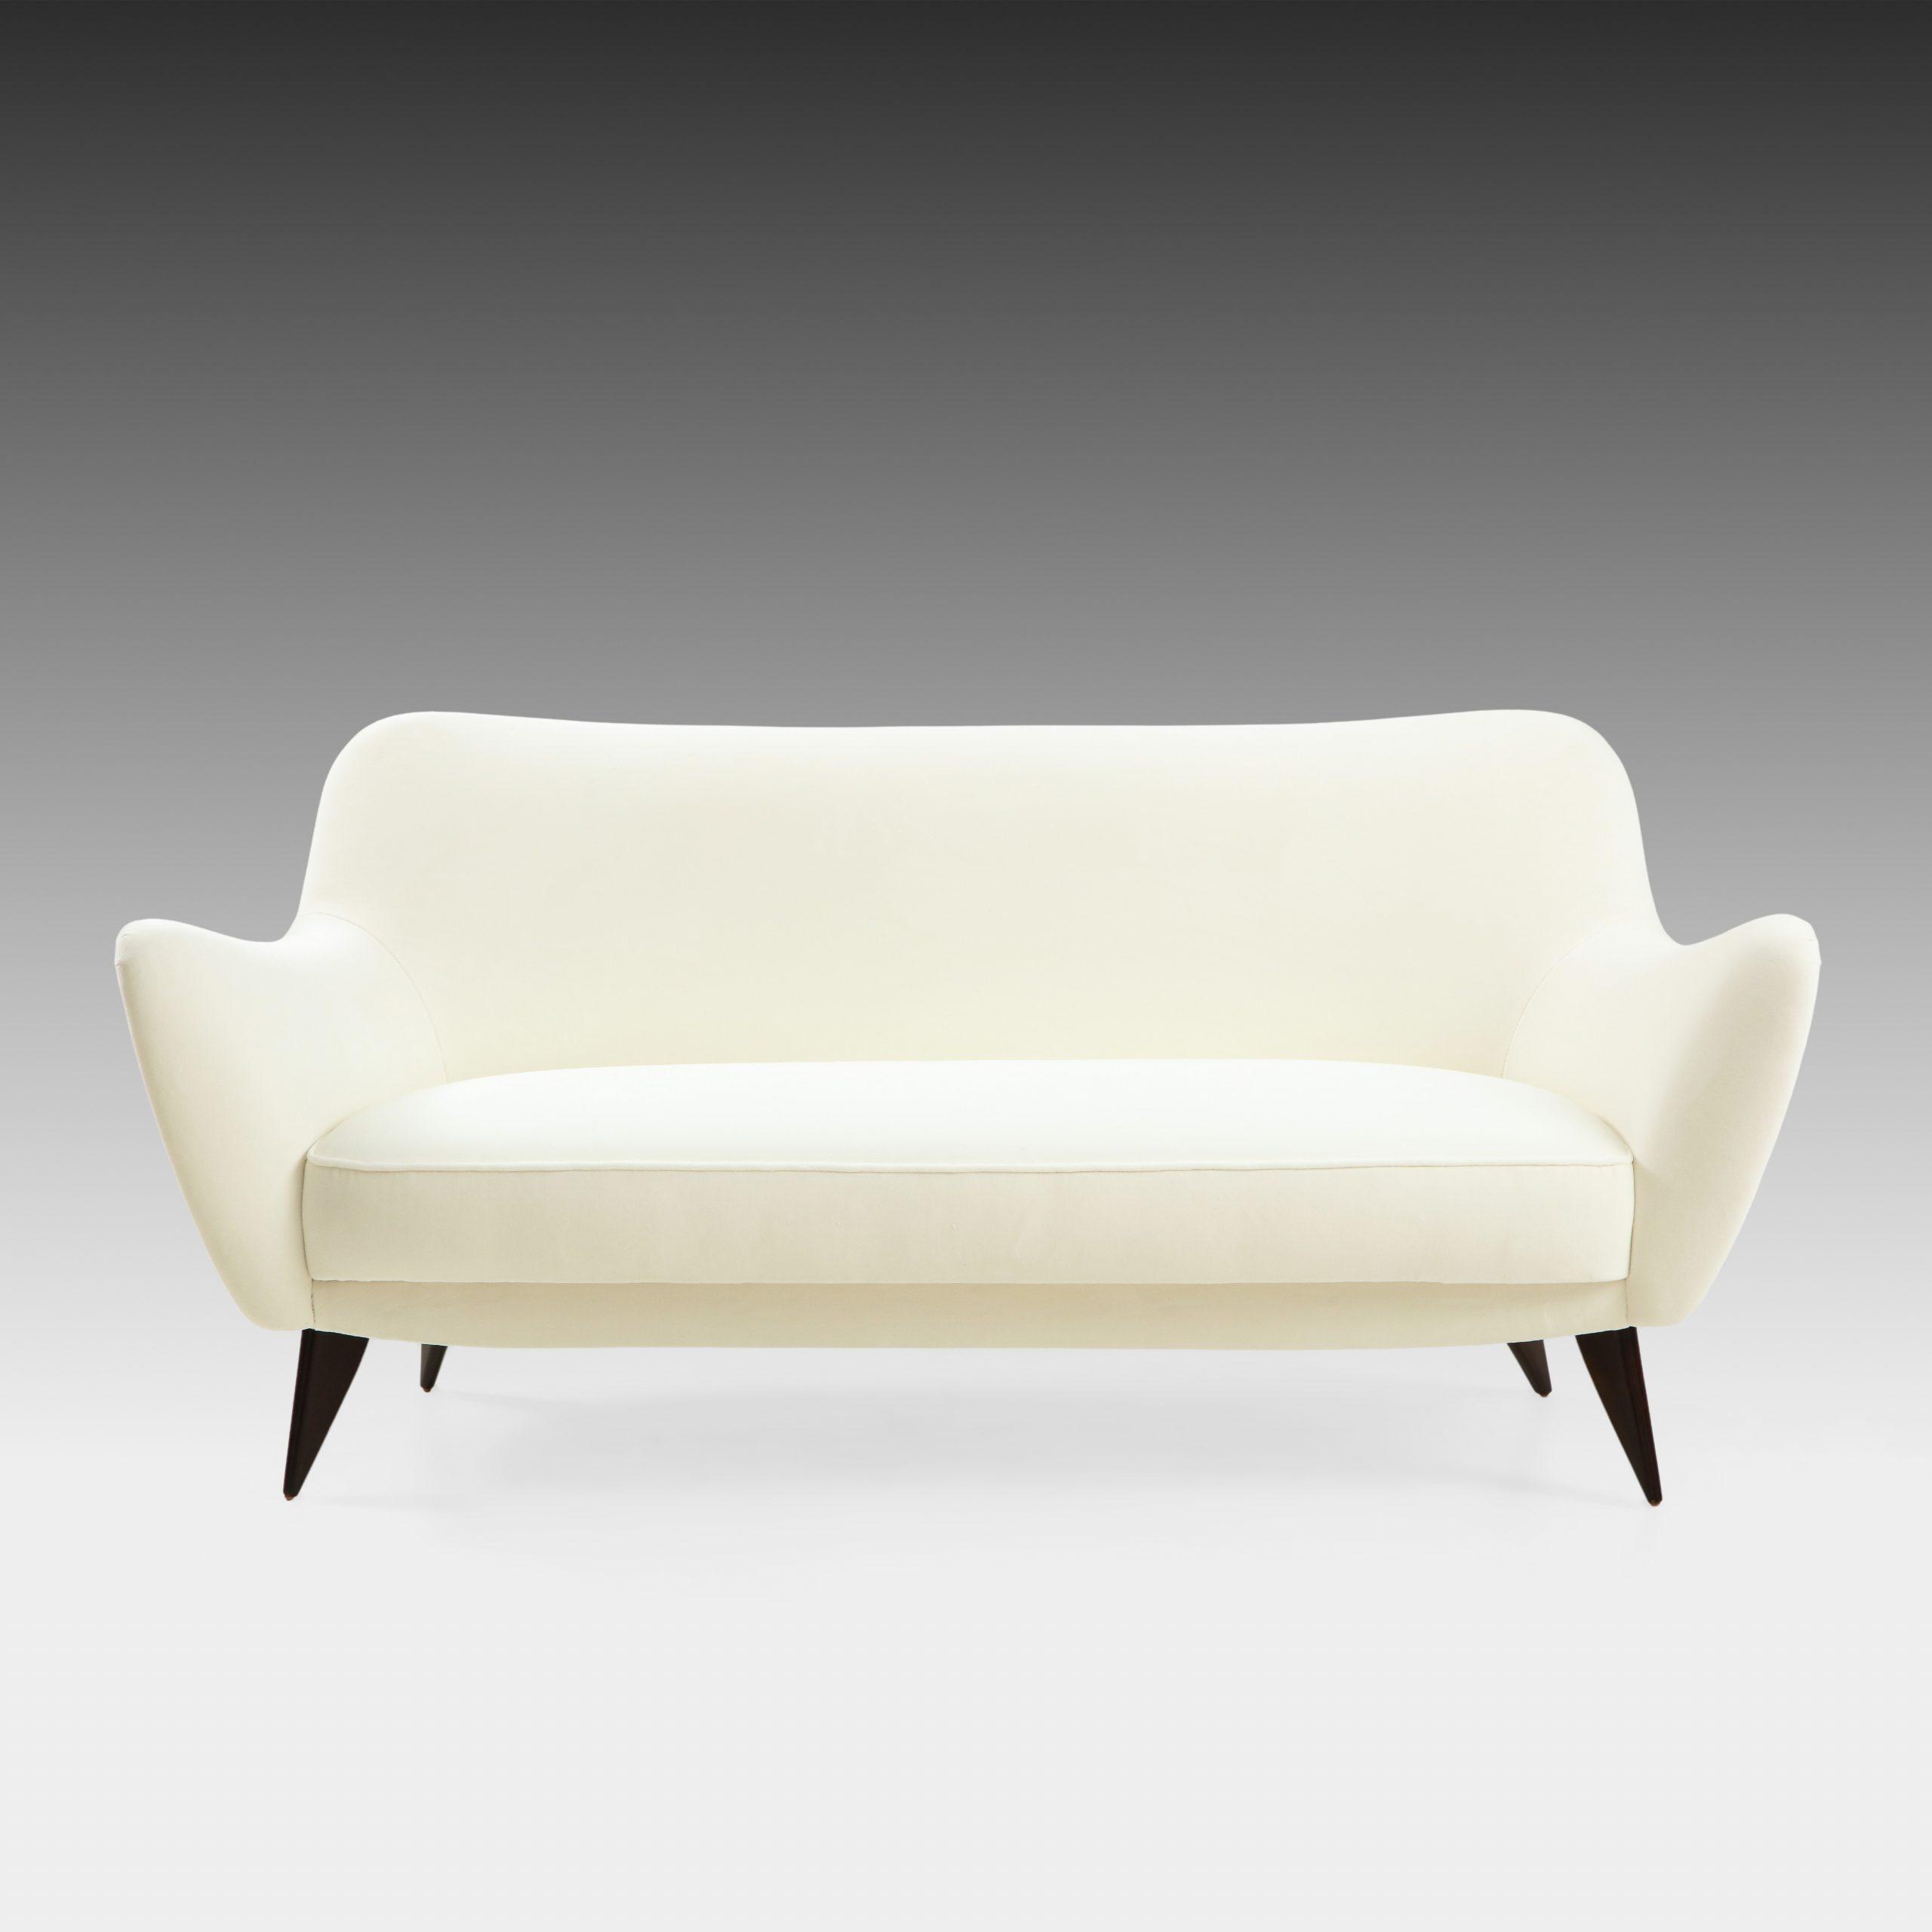 'Perla' Sofa by Giulia Veronesi for I.S.A. Bergamo   soyun k.